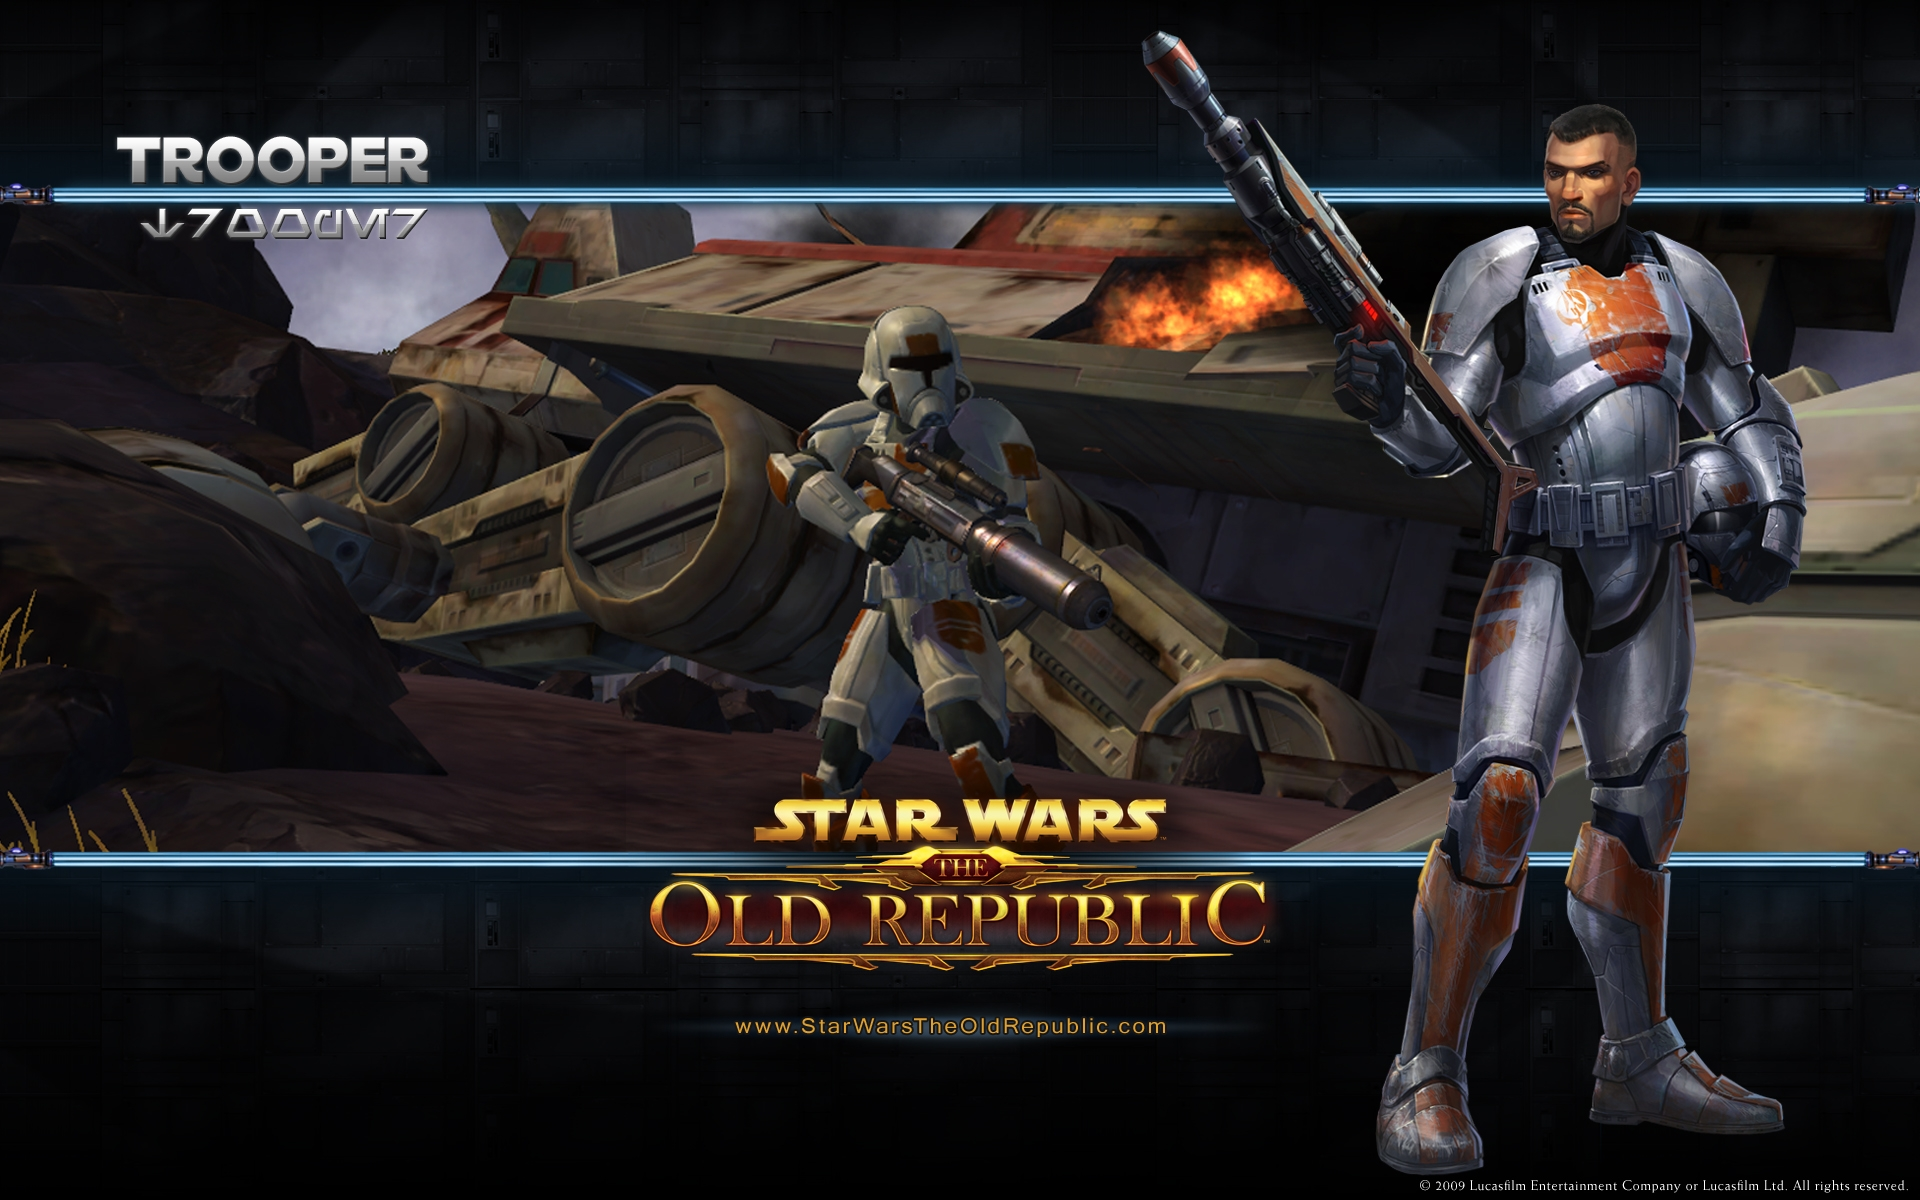 Star Wars The Old Republic Trooper Hd Wallpaper